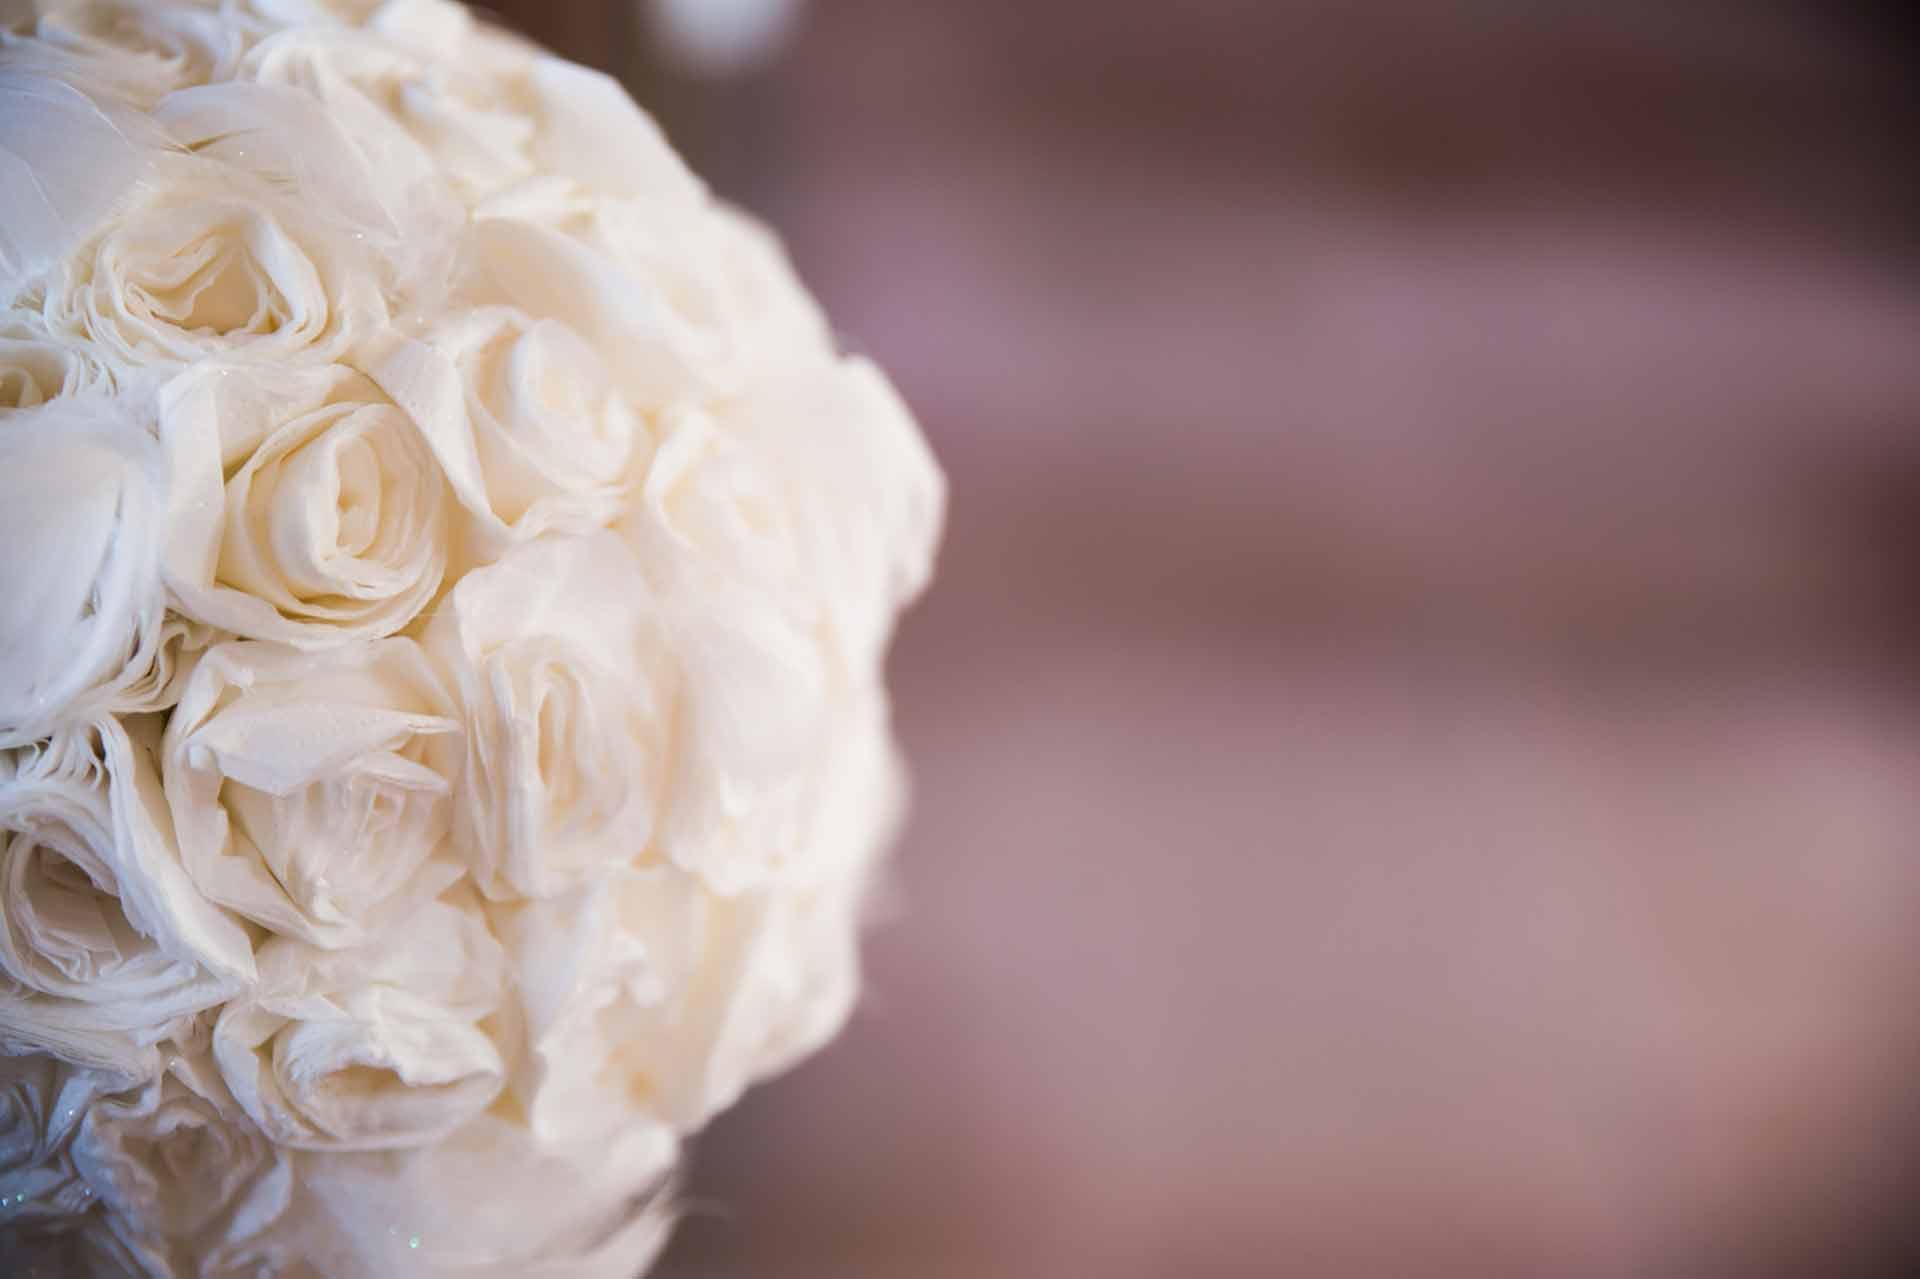 bg_wedding_sliders